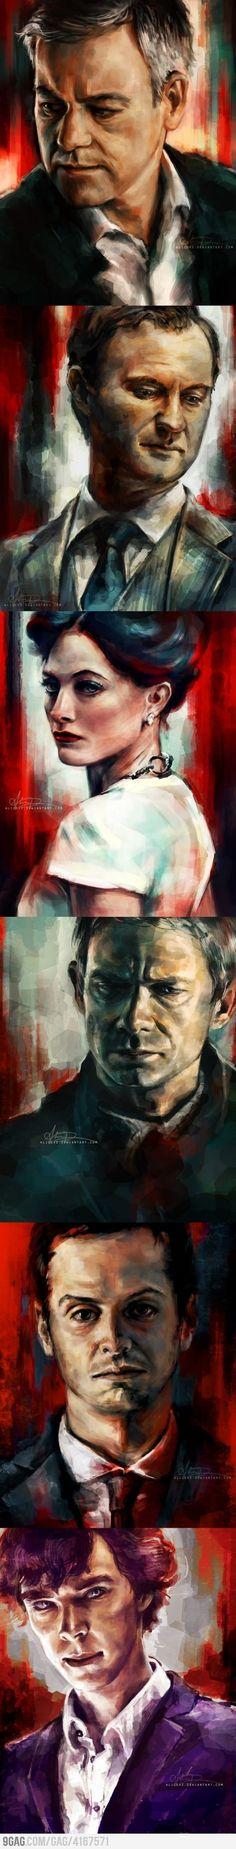 Wow... beautiful paintings of the Sherlock characters